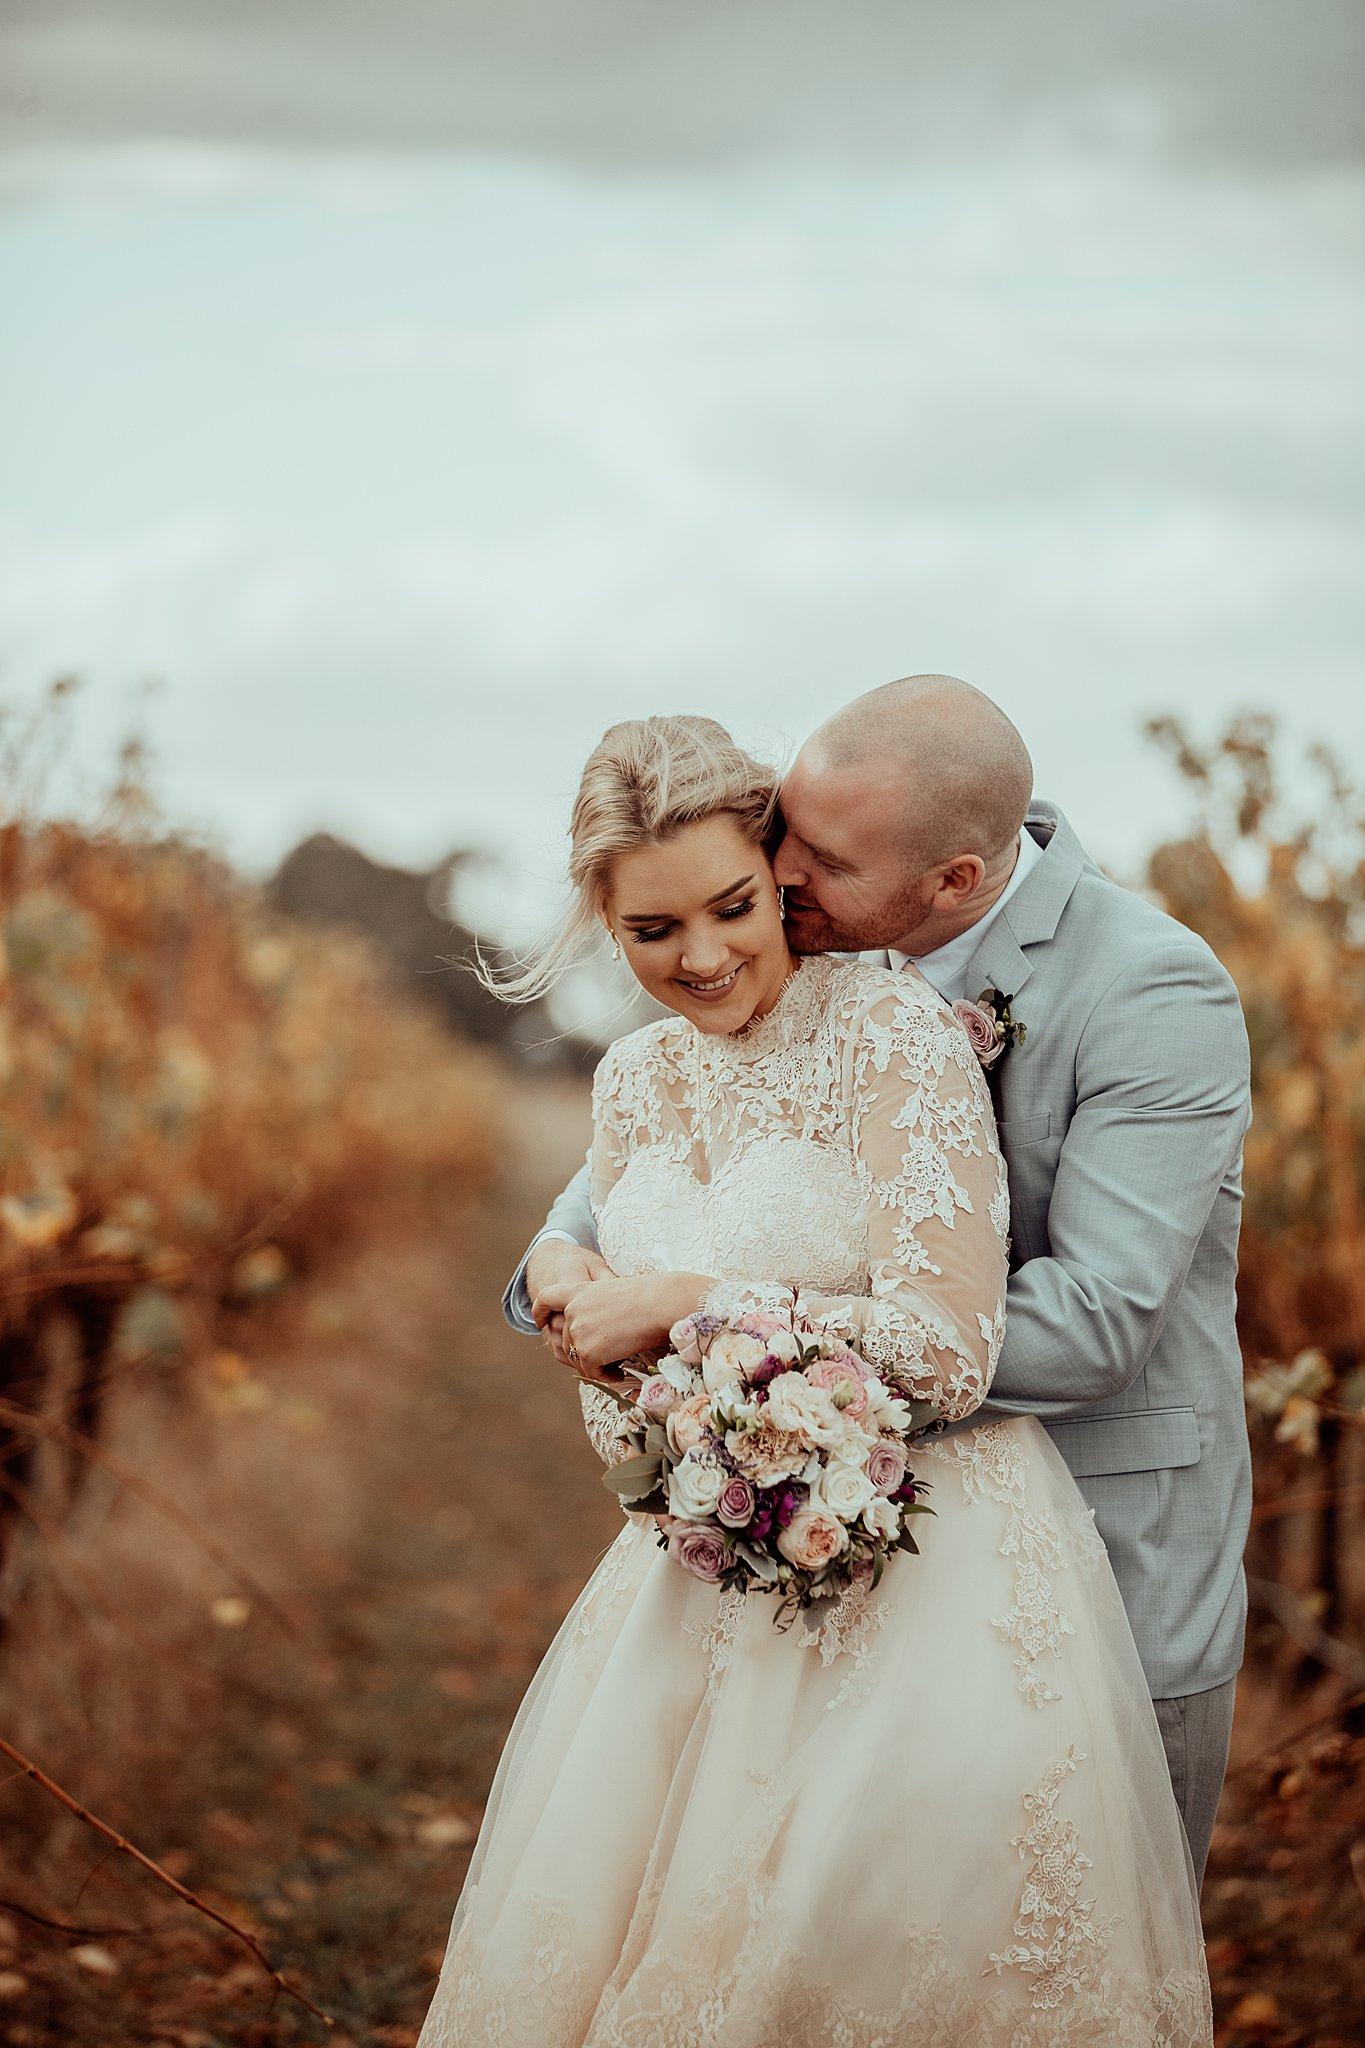 mickalathomas_puremacphotography_weddingphotographer_couplephotographer_Sheppartonphotographer_3451.jpg